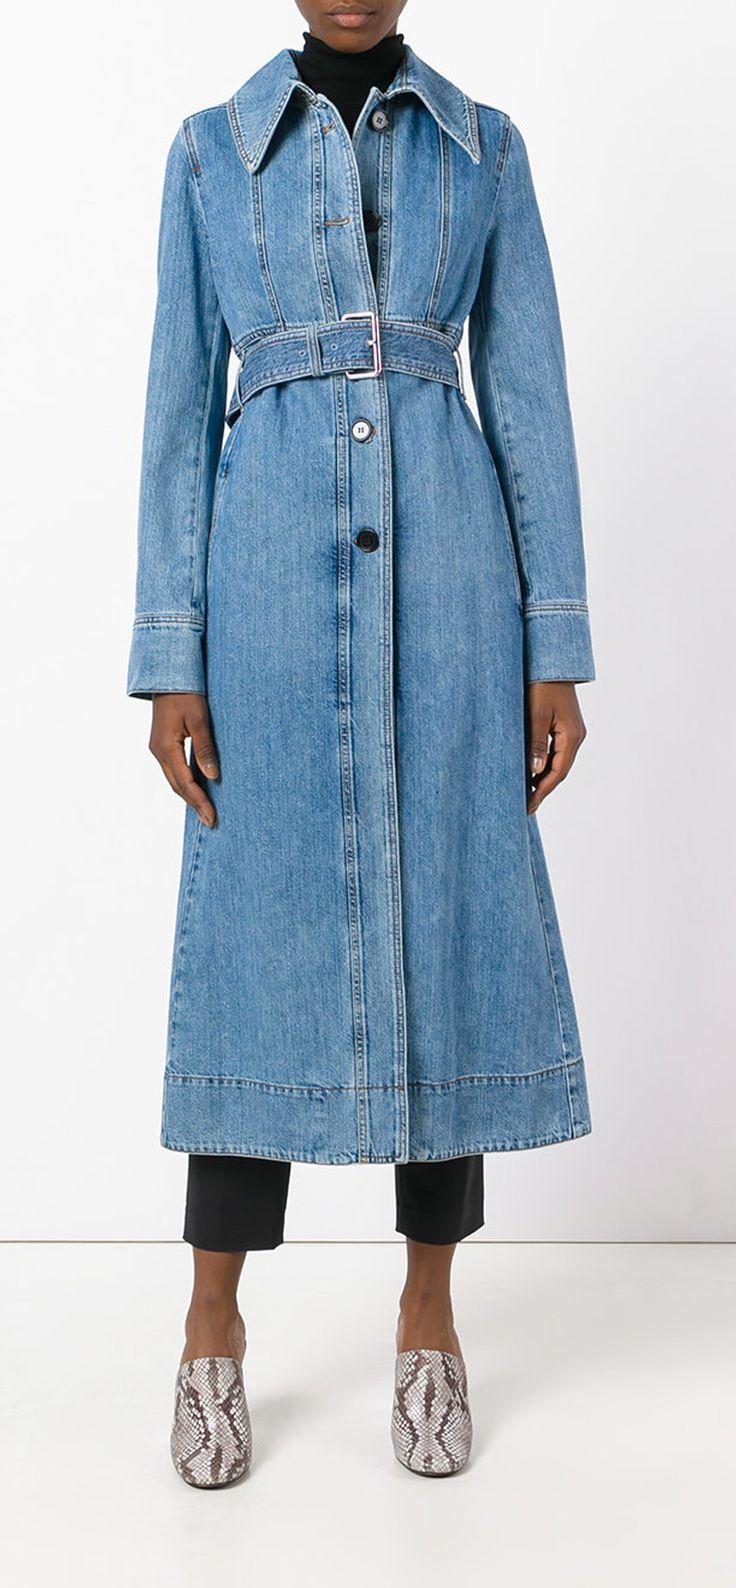 MARNI belted denim coat, explore new season Marni on Farfetch now.